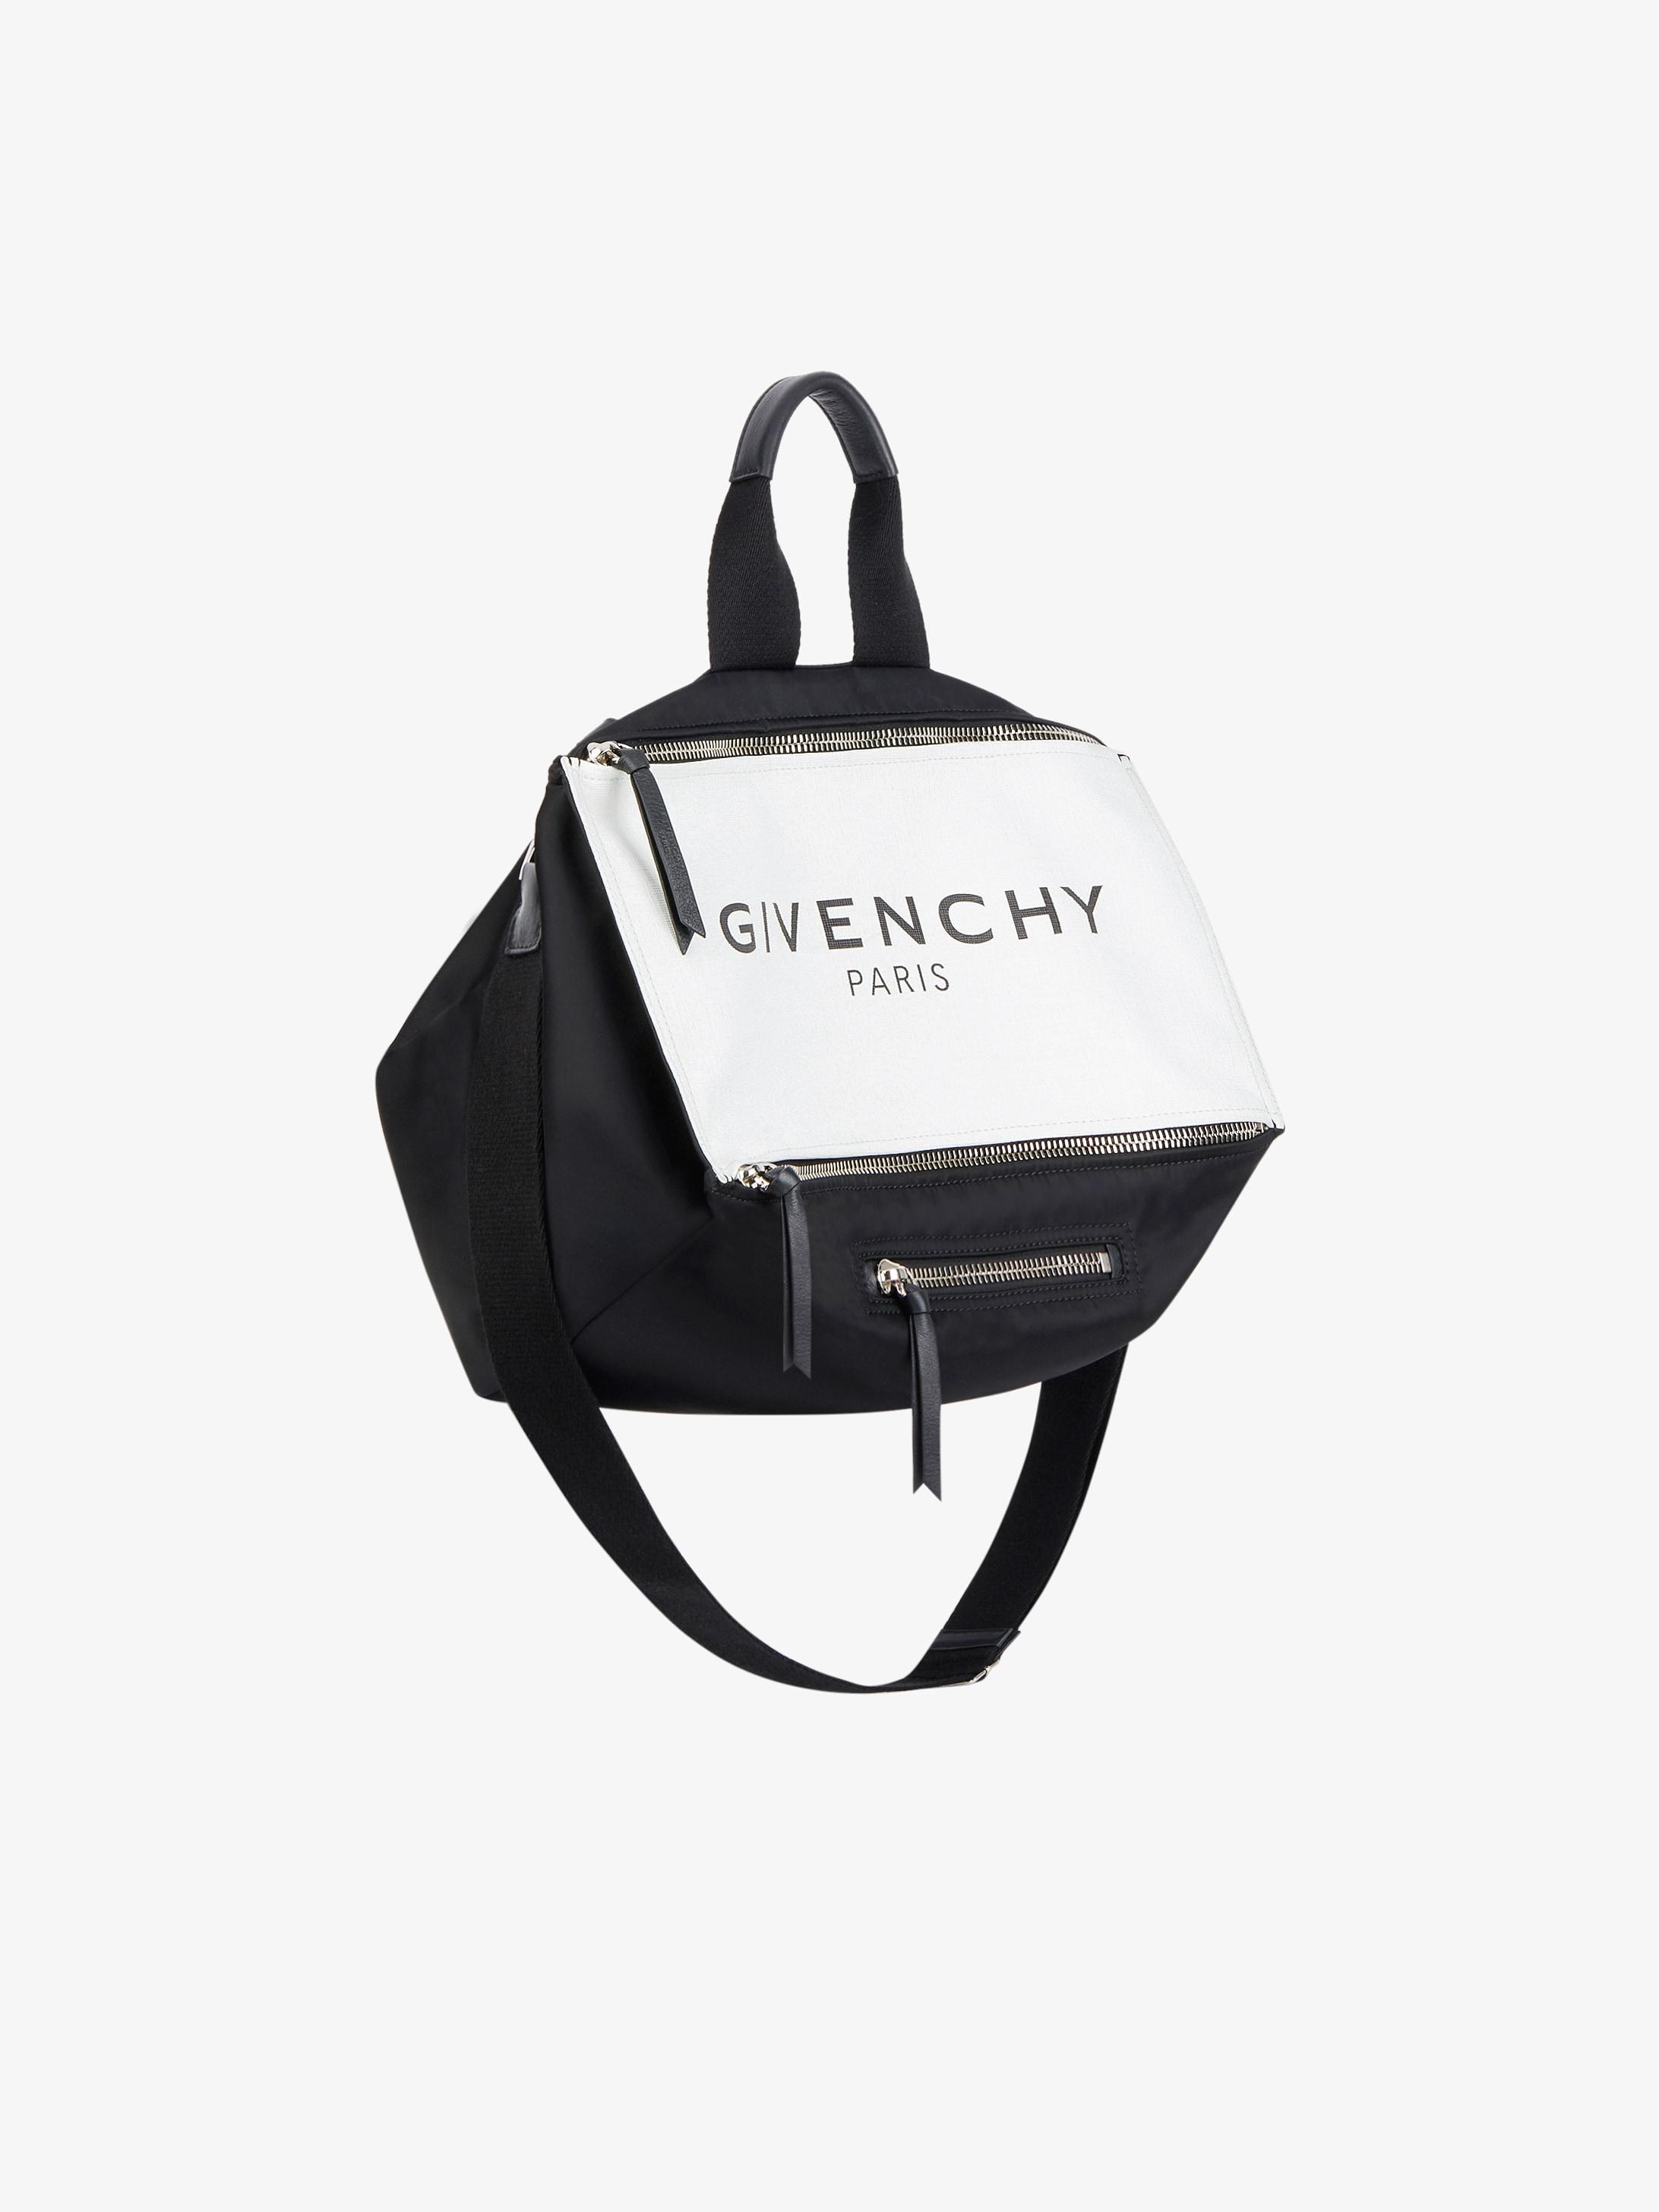 GIVENCHY PARIS Pandora Messenger glow in the dark bag